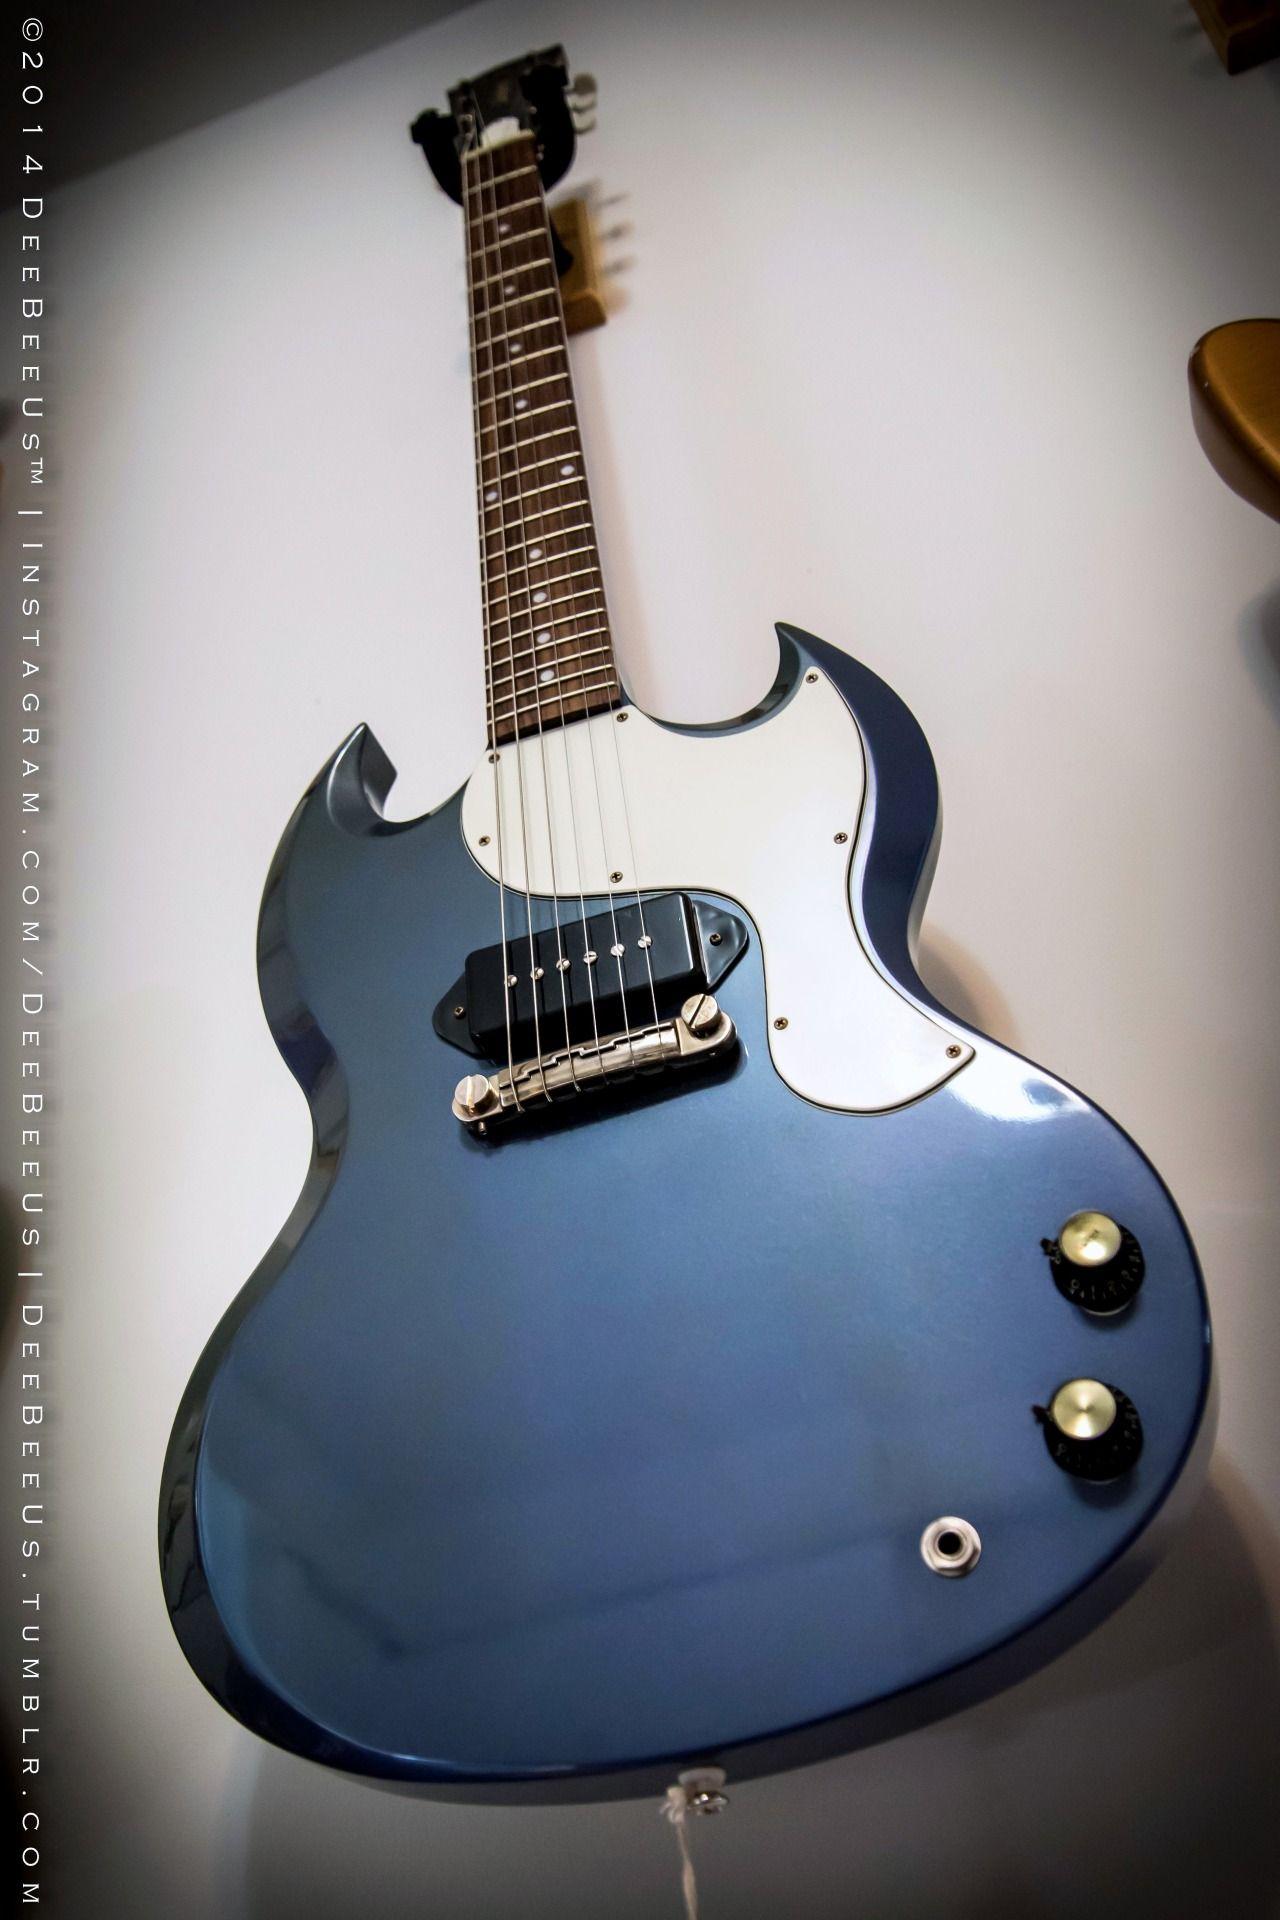 shyboy guitars of toronto canada. Black Bedroom Furniture Sets. Home Design Ideas